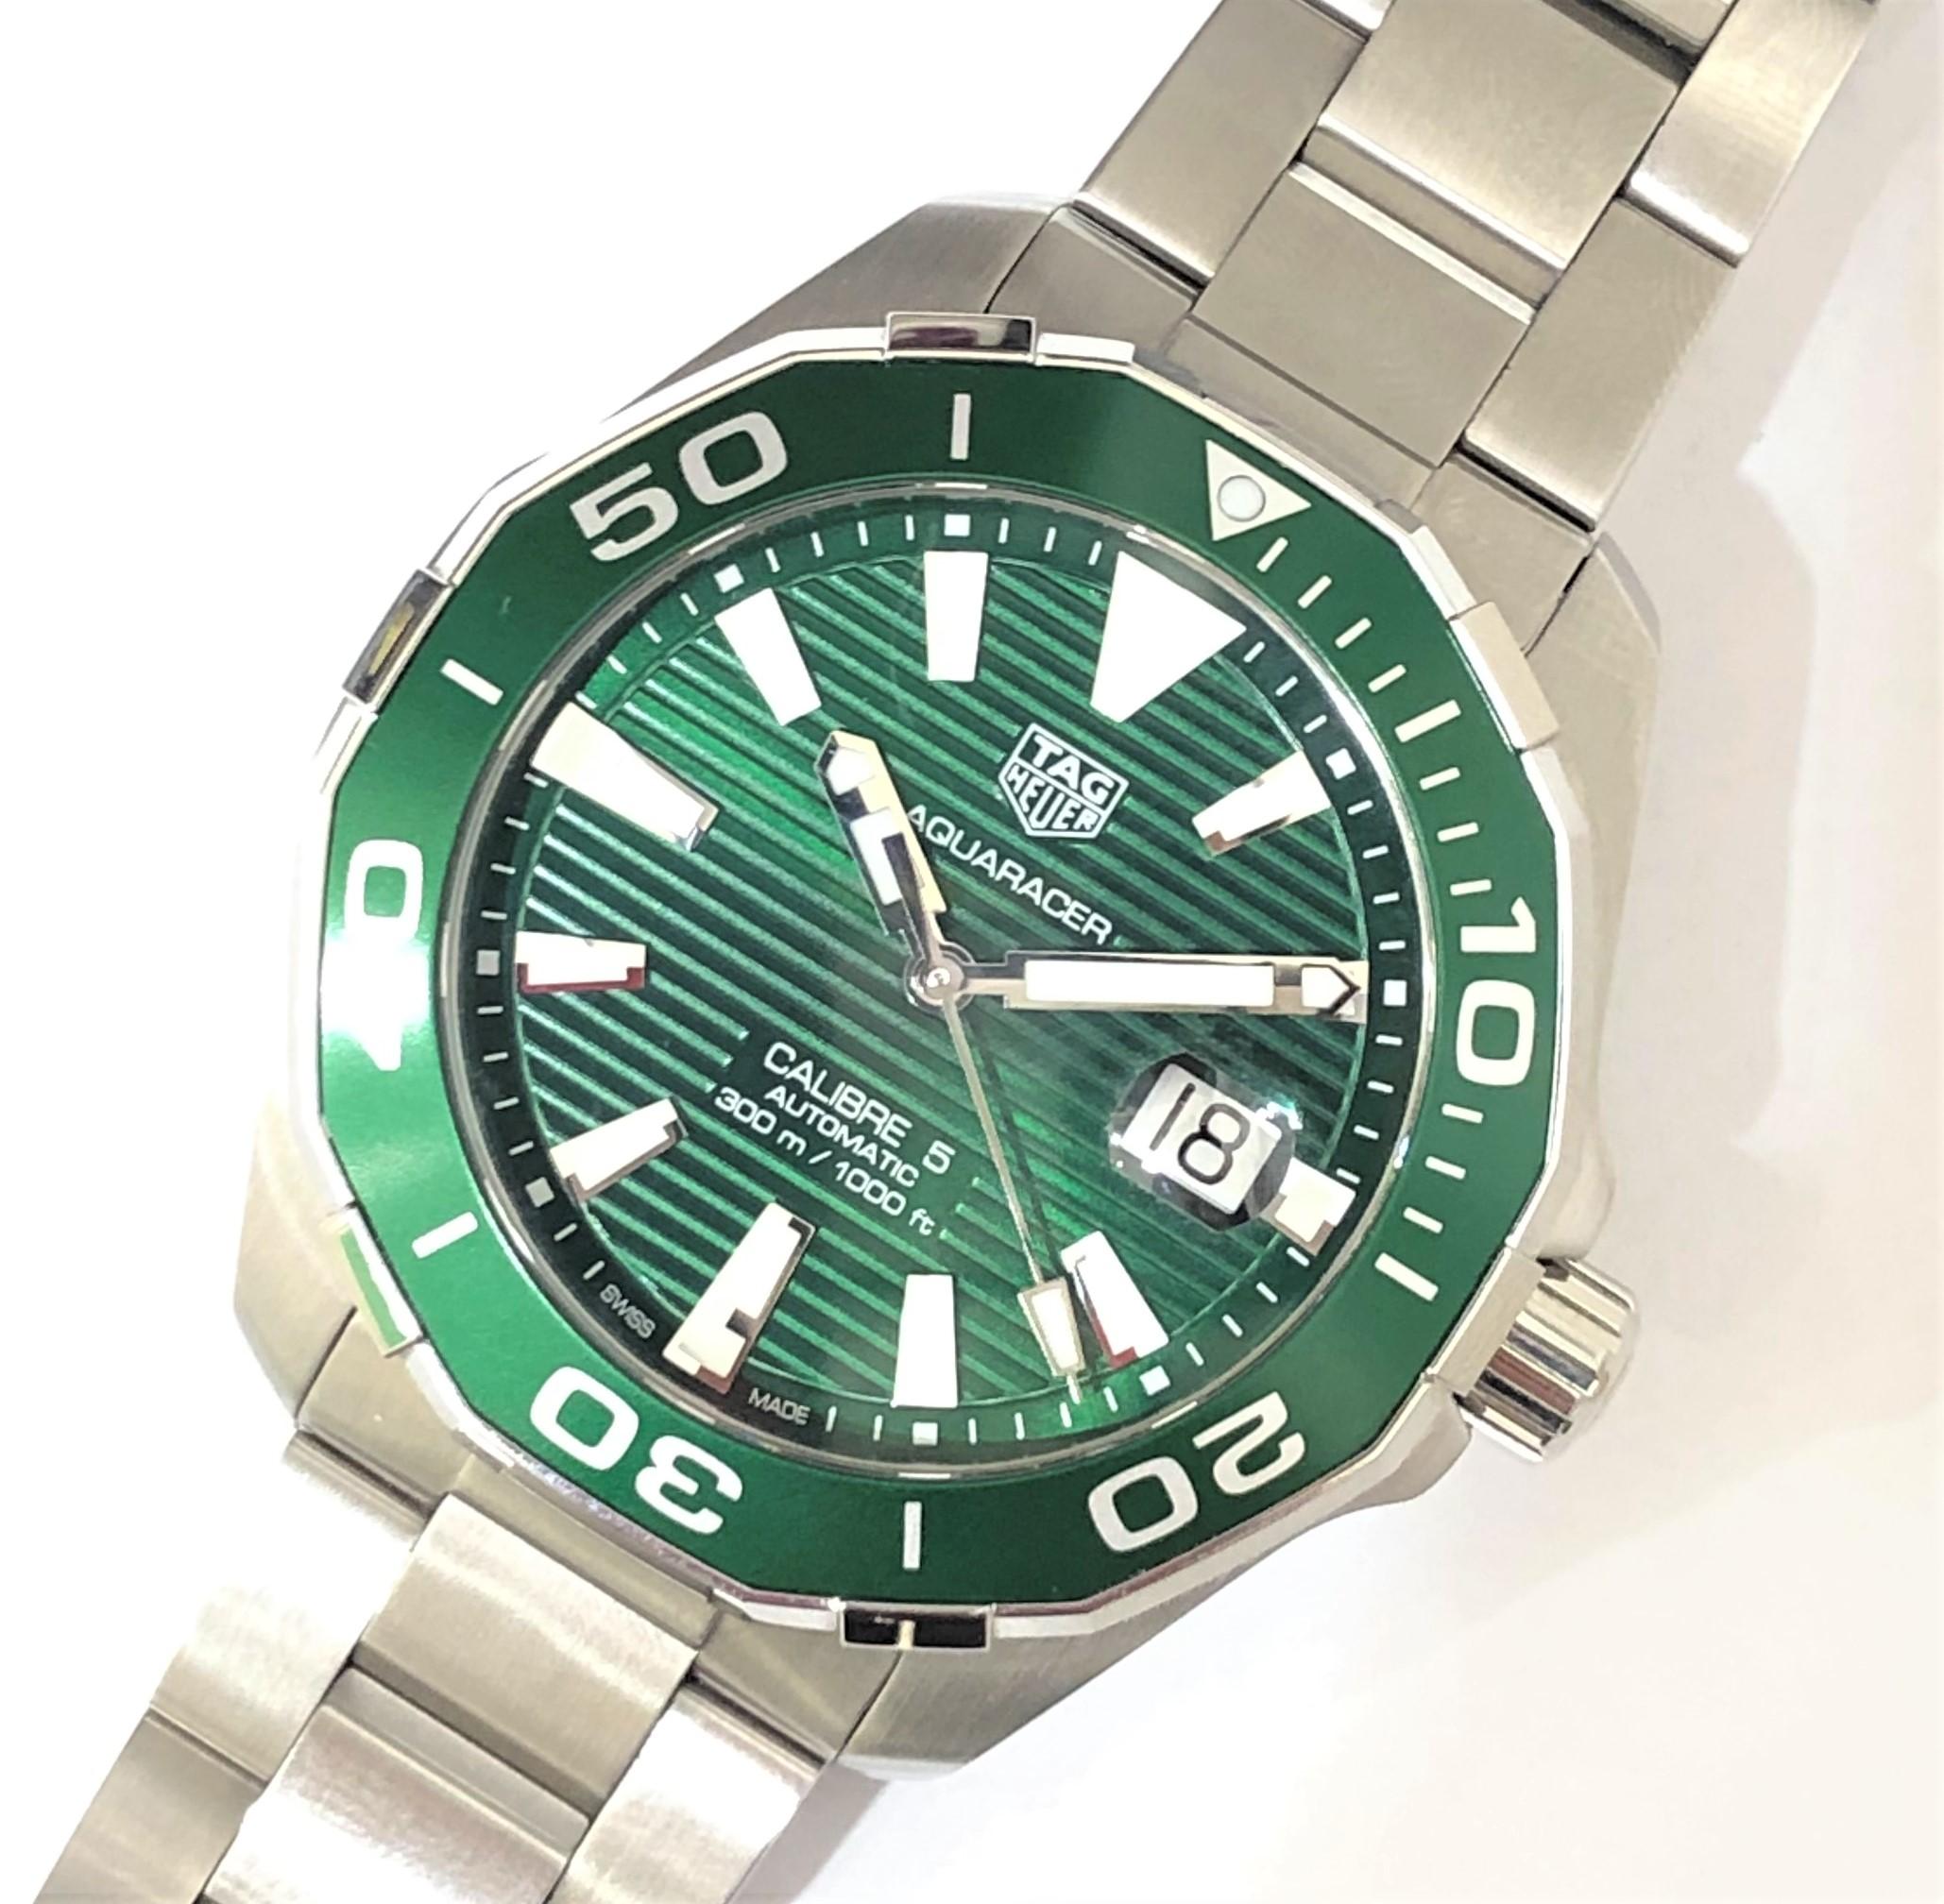 【TAG HEUER/タグホイヤー】アクアレーサー キャリバー5 WAY201S AT 腕時計